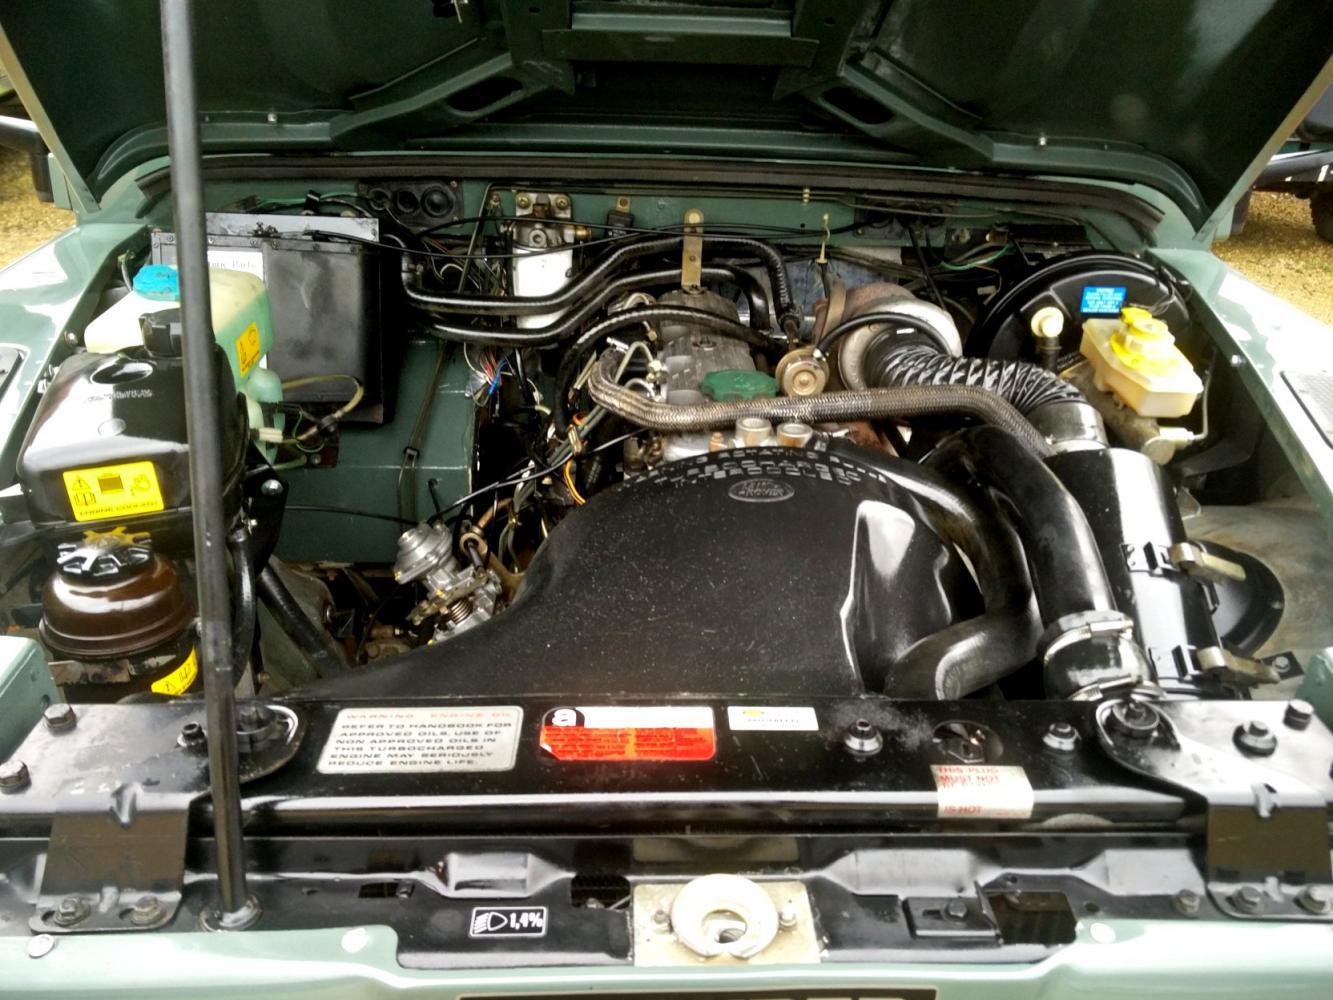 Click image for larger version  Name:1991 LR LHD Defender 90 Keswick Green Tdi 1 engine bay.jpg Views:117 Size:189.5 KB ID:215601